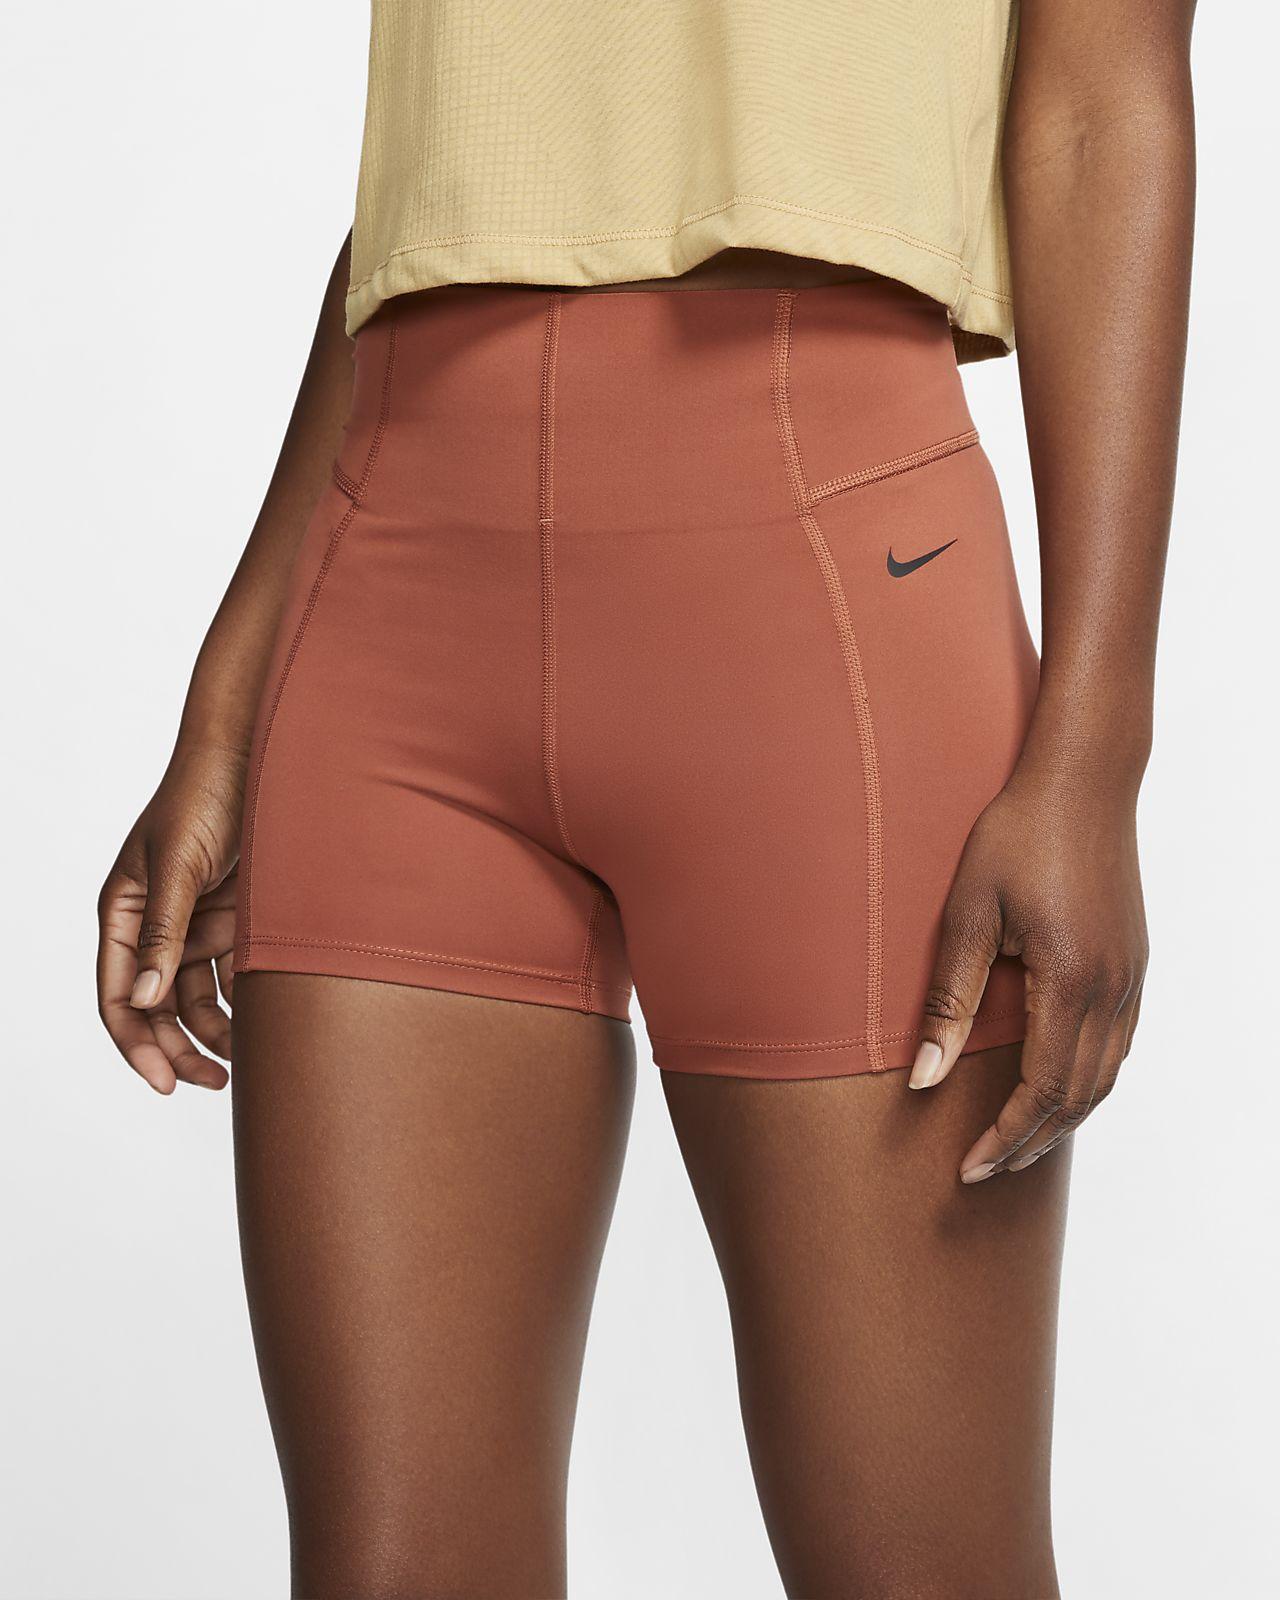 Dri Nike Nike Damen Damen Trainingsshorts FIT Nike FIT Dri Trainingsshorts vmNwn80O